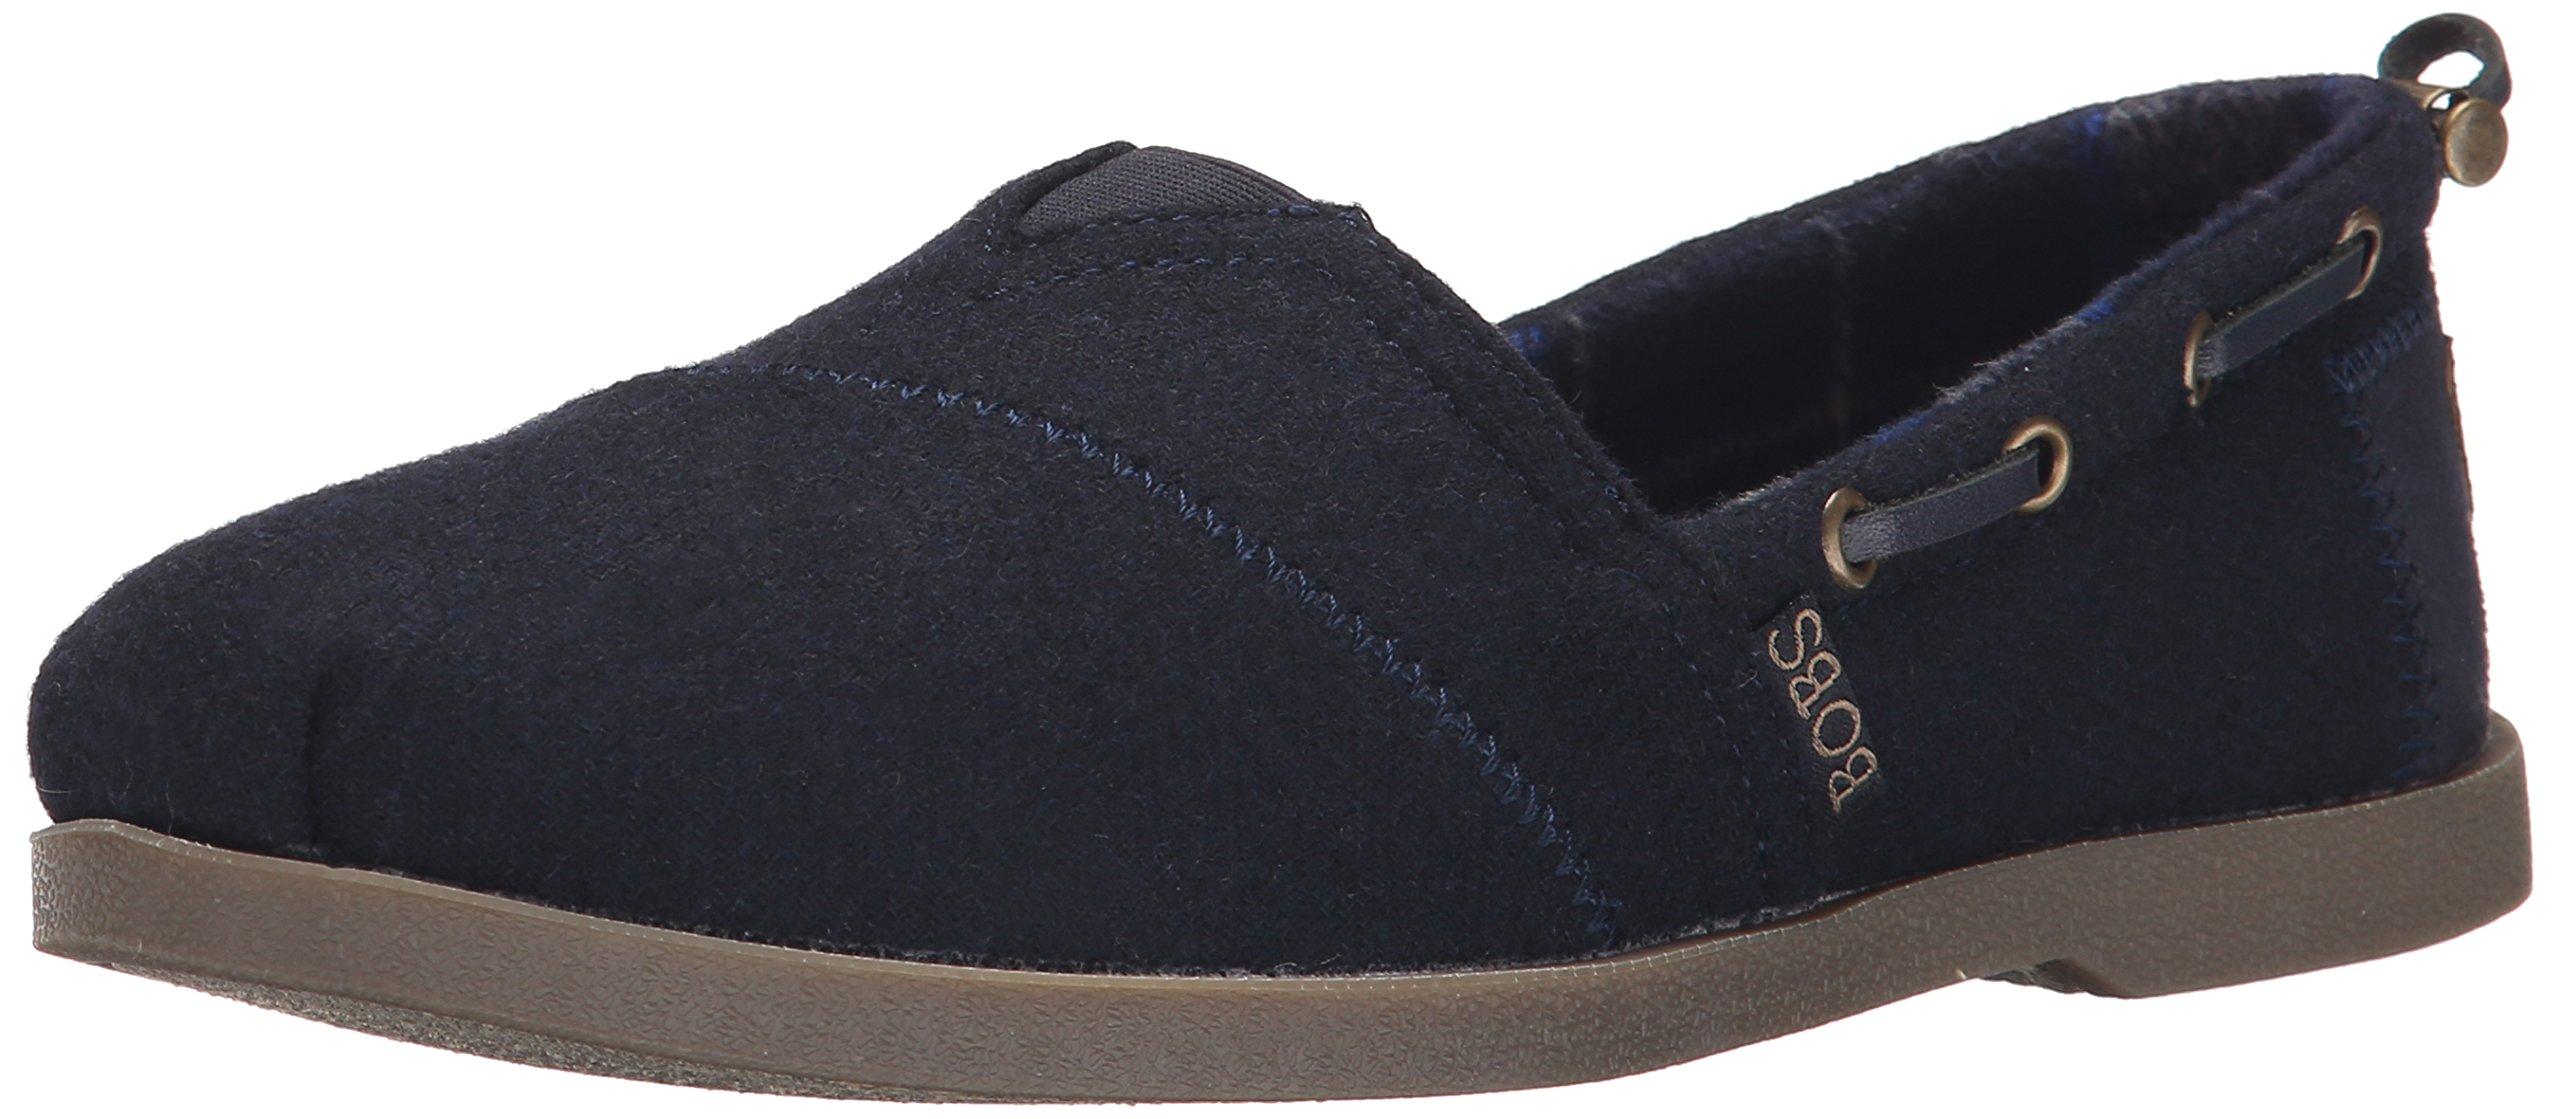 BOBS from Skechers Women's Chill Luxe Shoe, Navy Wool, 7.5 M US